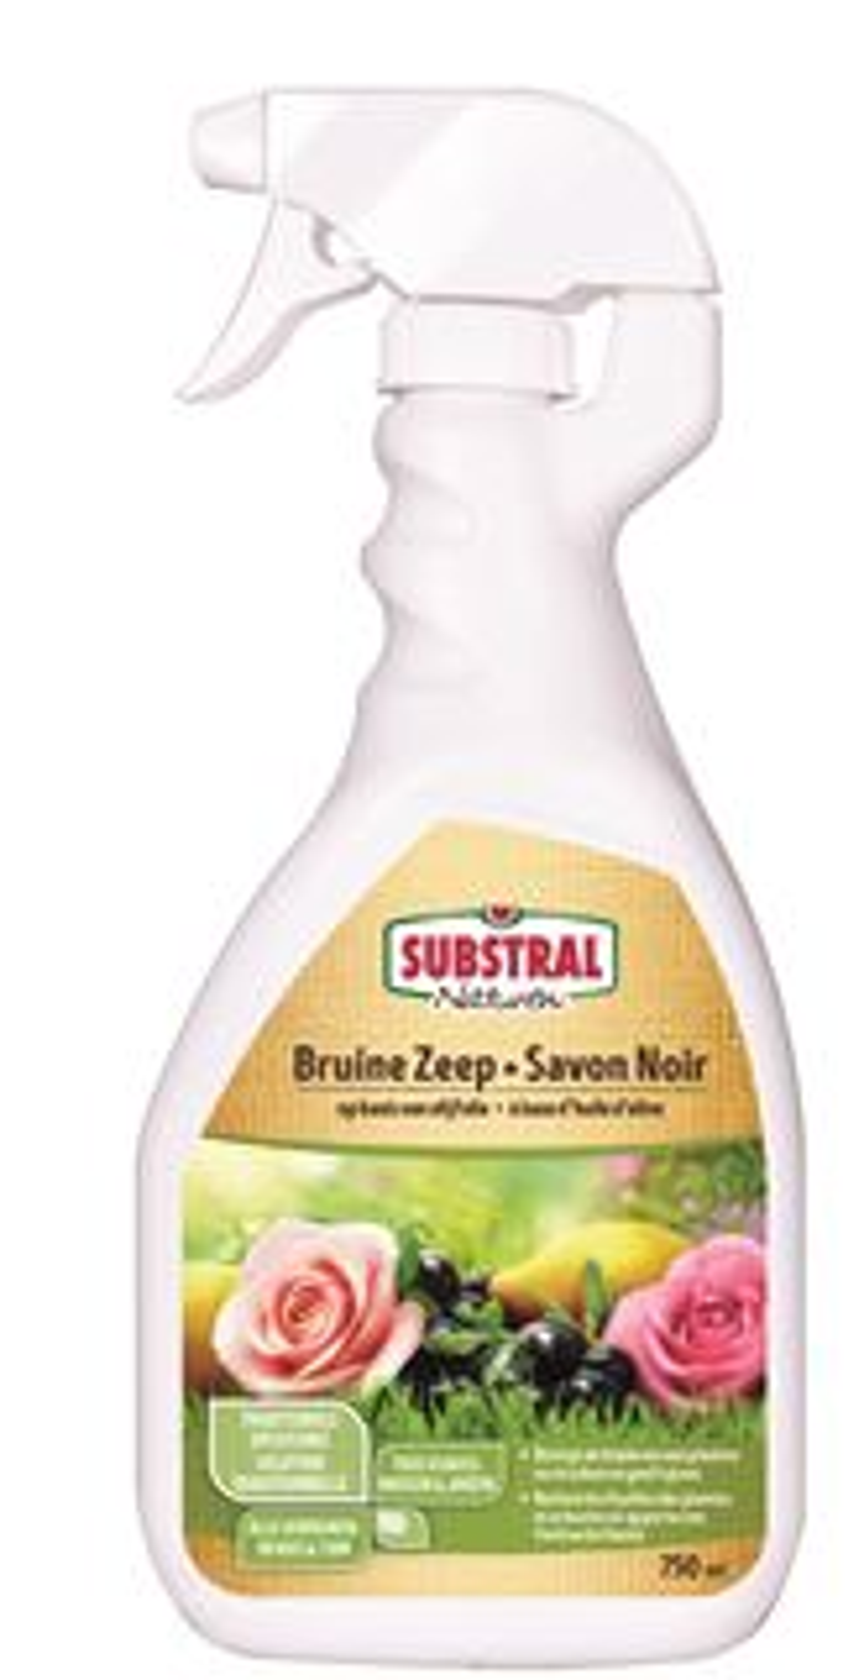 Substral-Naturen-Bruine-Zeep-750ml